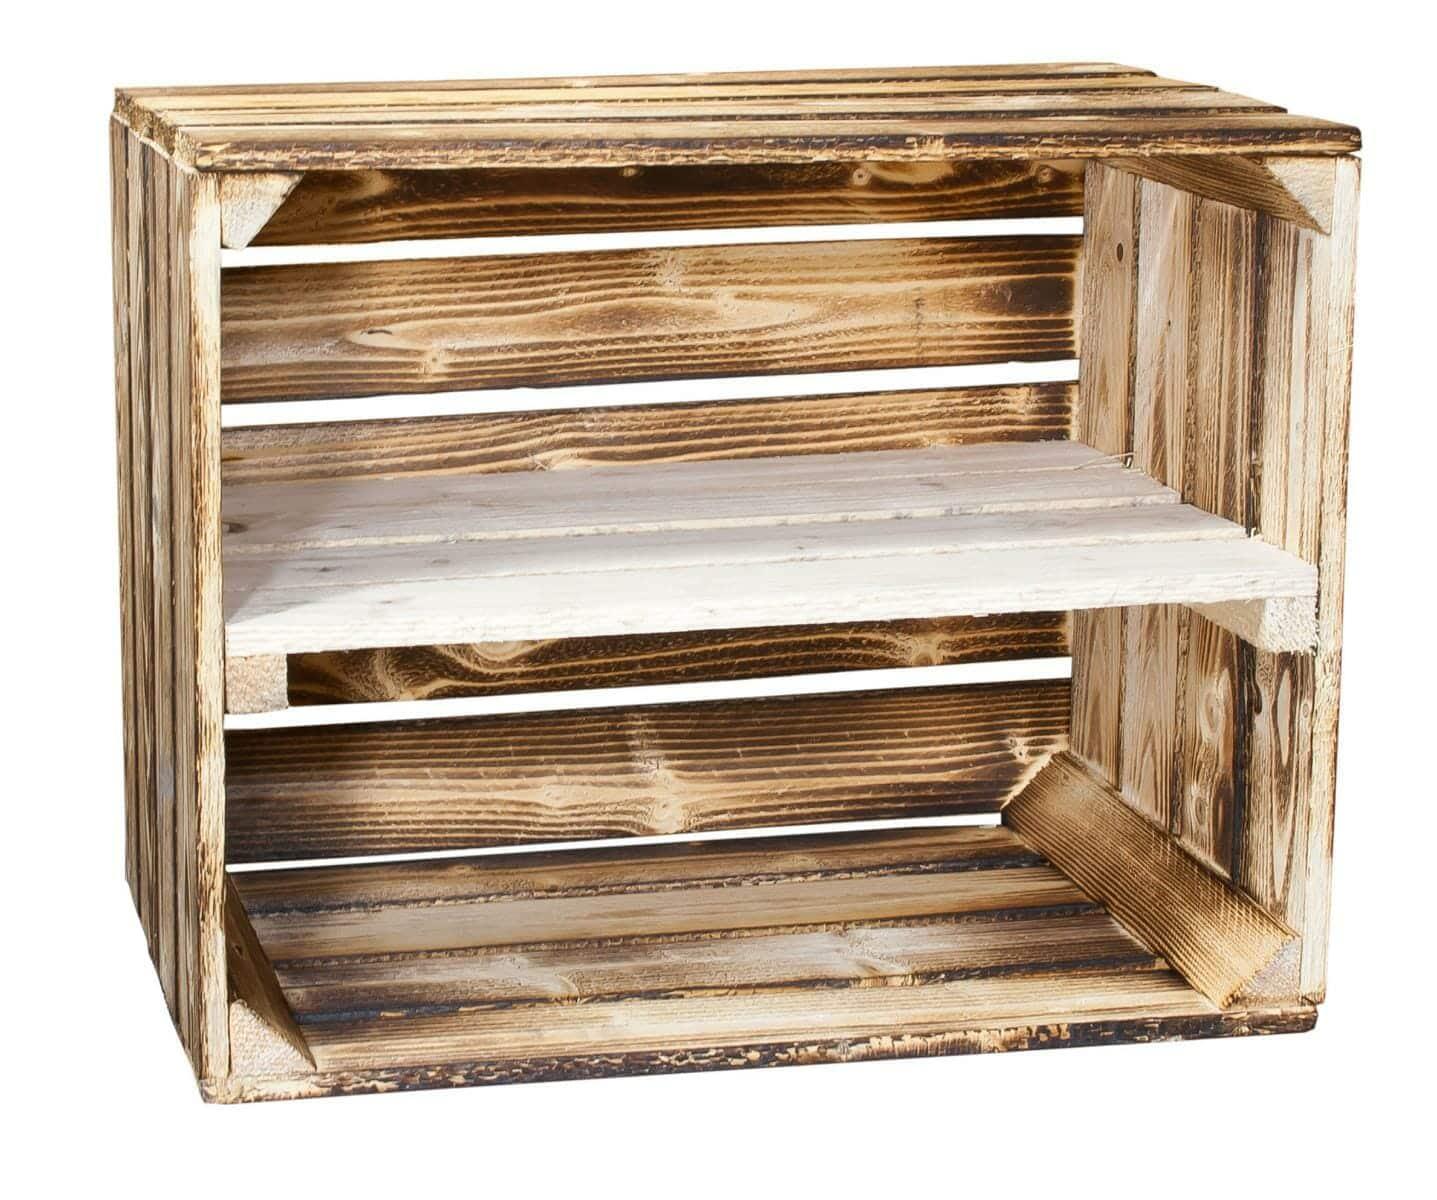 holzkisten regal 50x40x30 ideal als schuhregal deko kiste. Black Bedroom Furniture Sets. Home Design Ideas